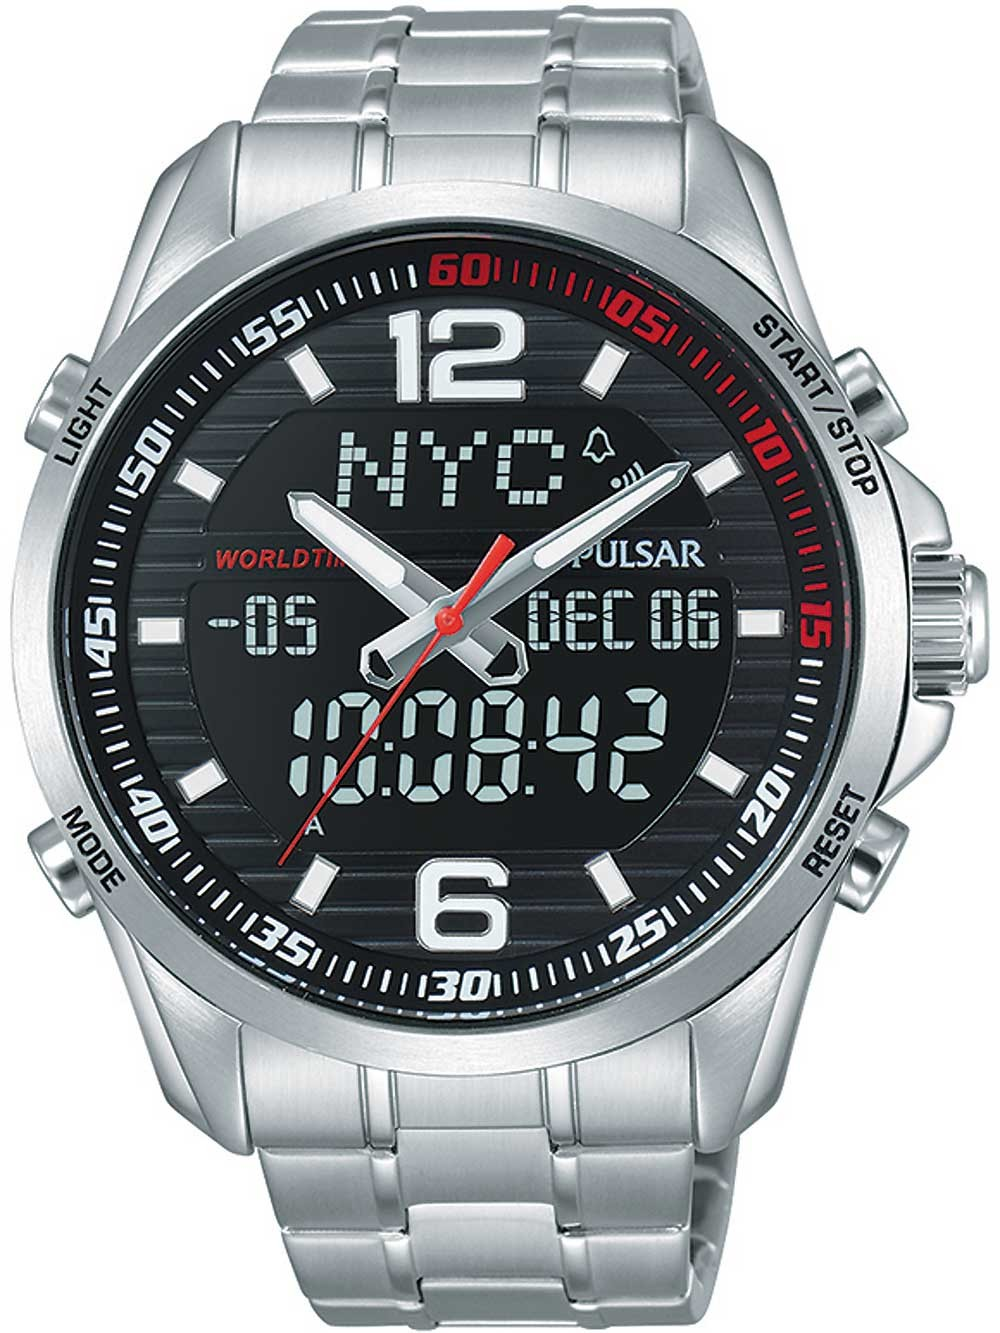 ceas barbatesc pulsar pz4001x1 ana-digi 45mm 10atm